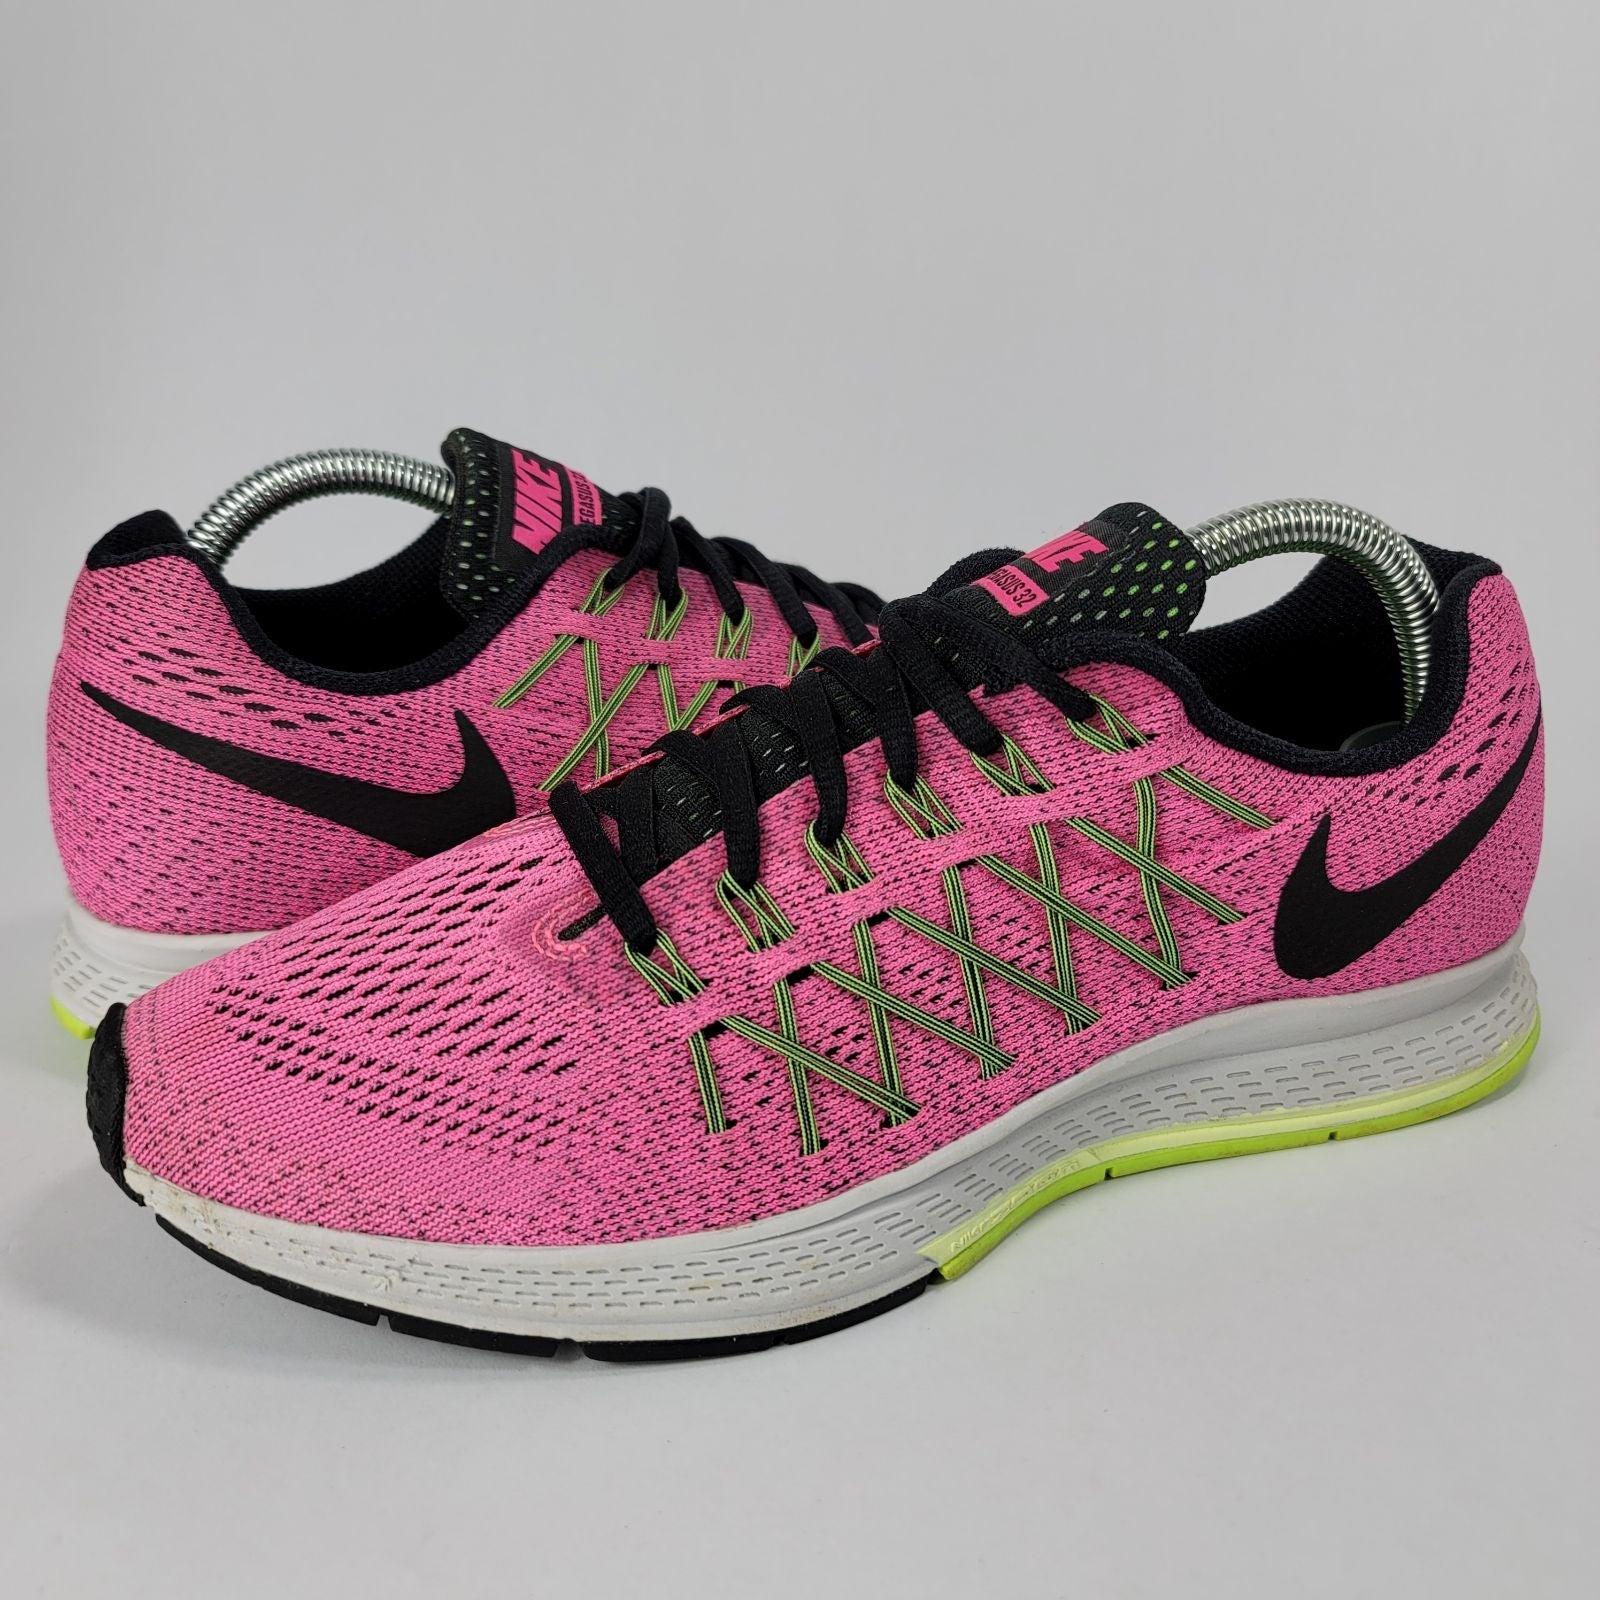 Nike Air Pegasus 32 Running Shoes SZ 9.5